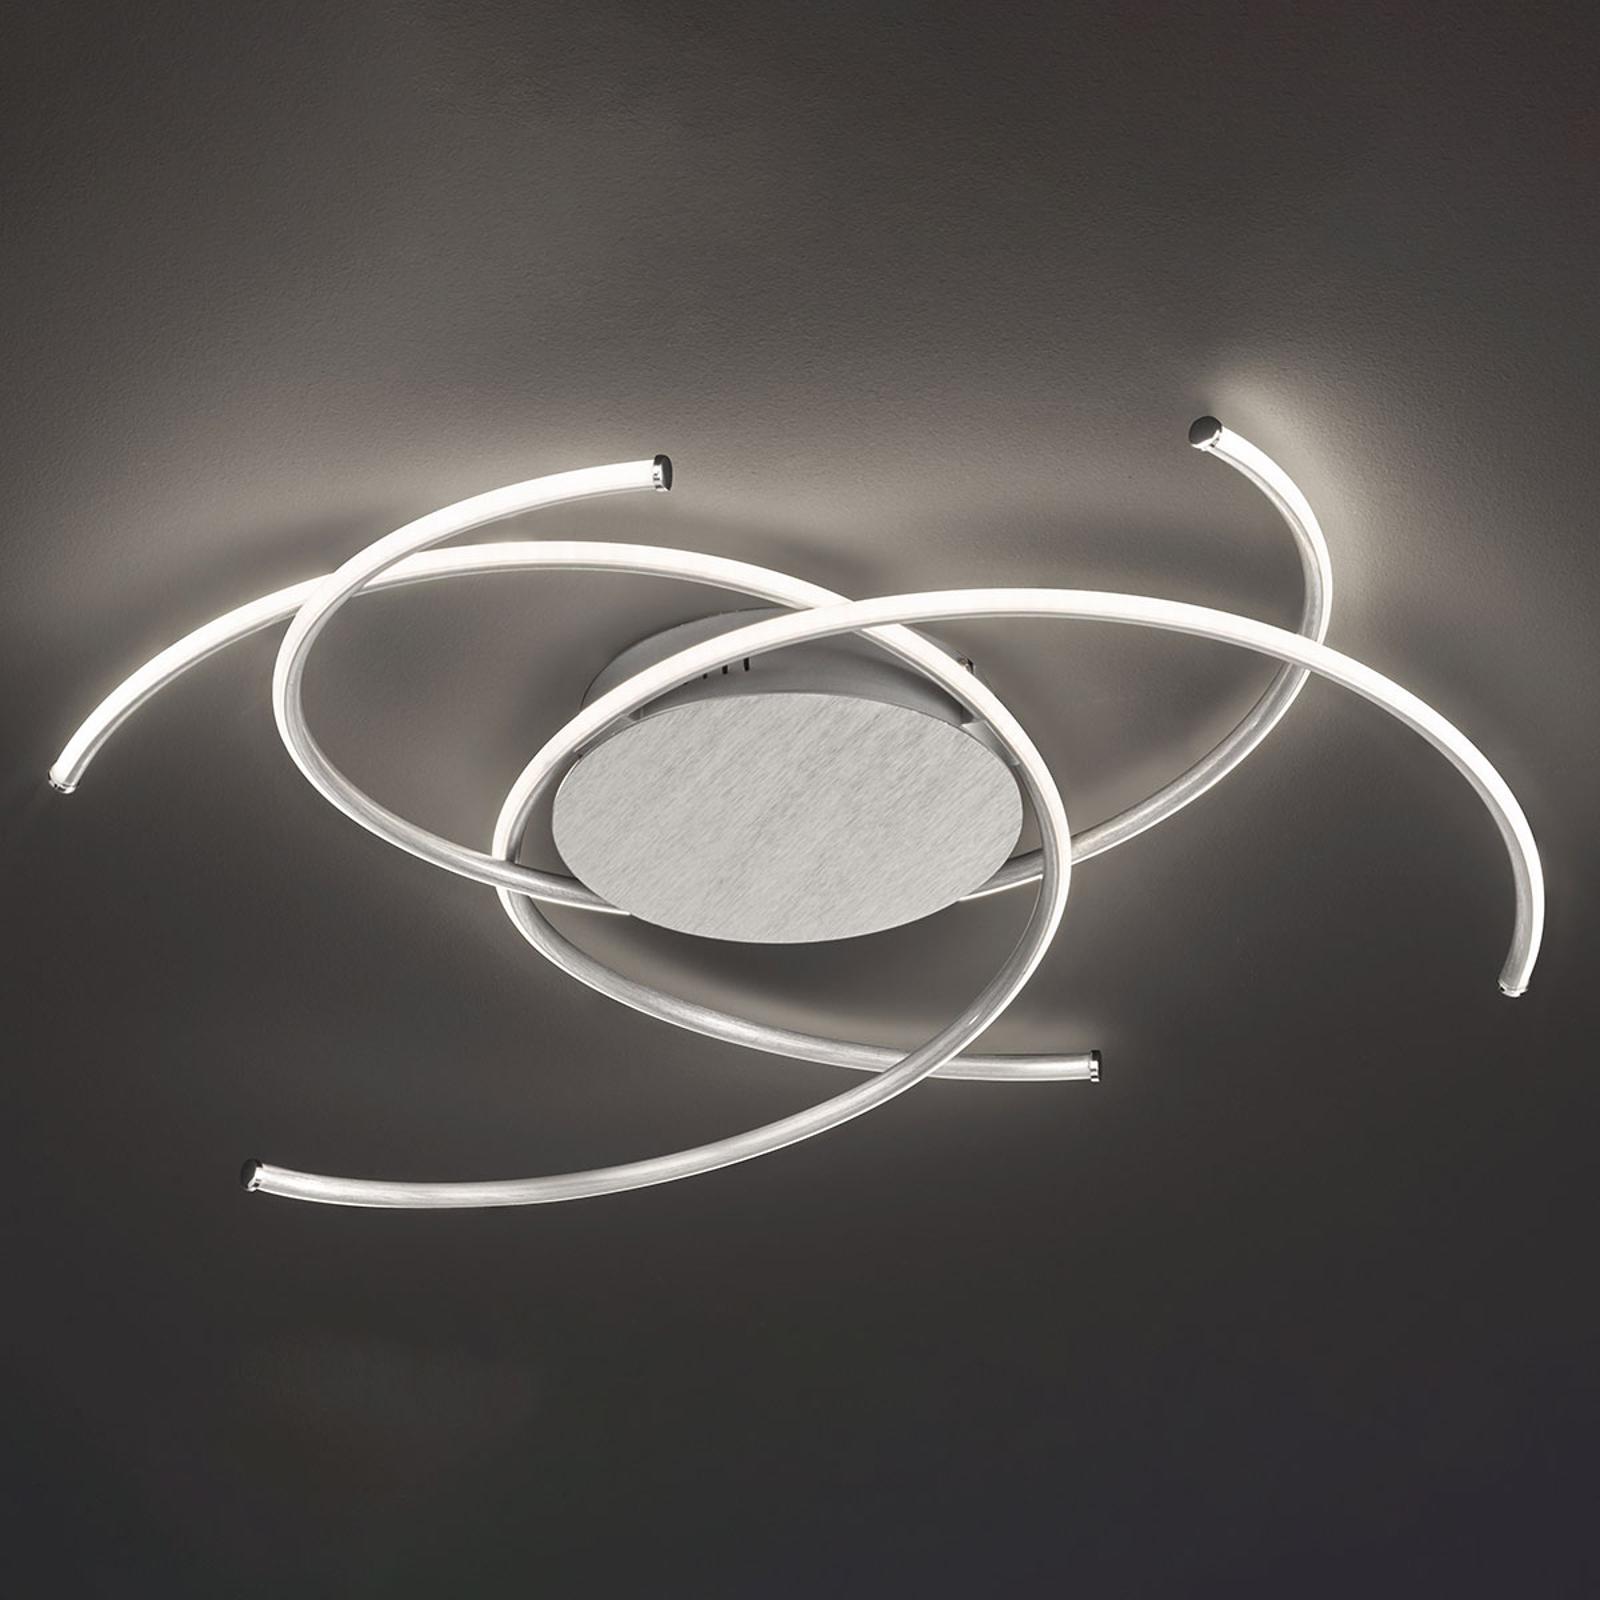 LED-Deckenleuchte Juls, Aluminium gebürstet